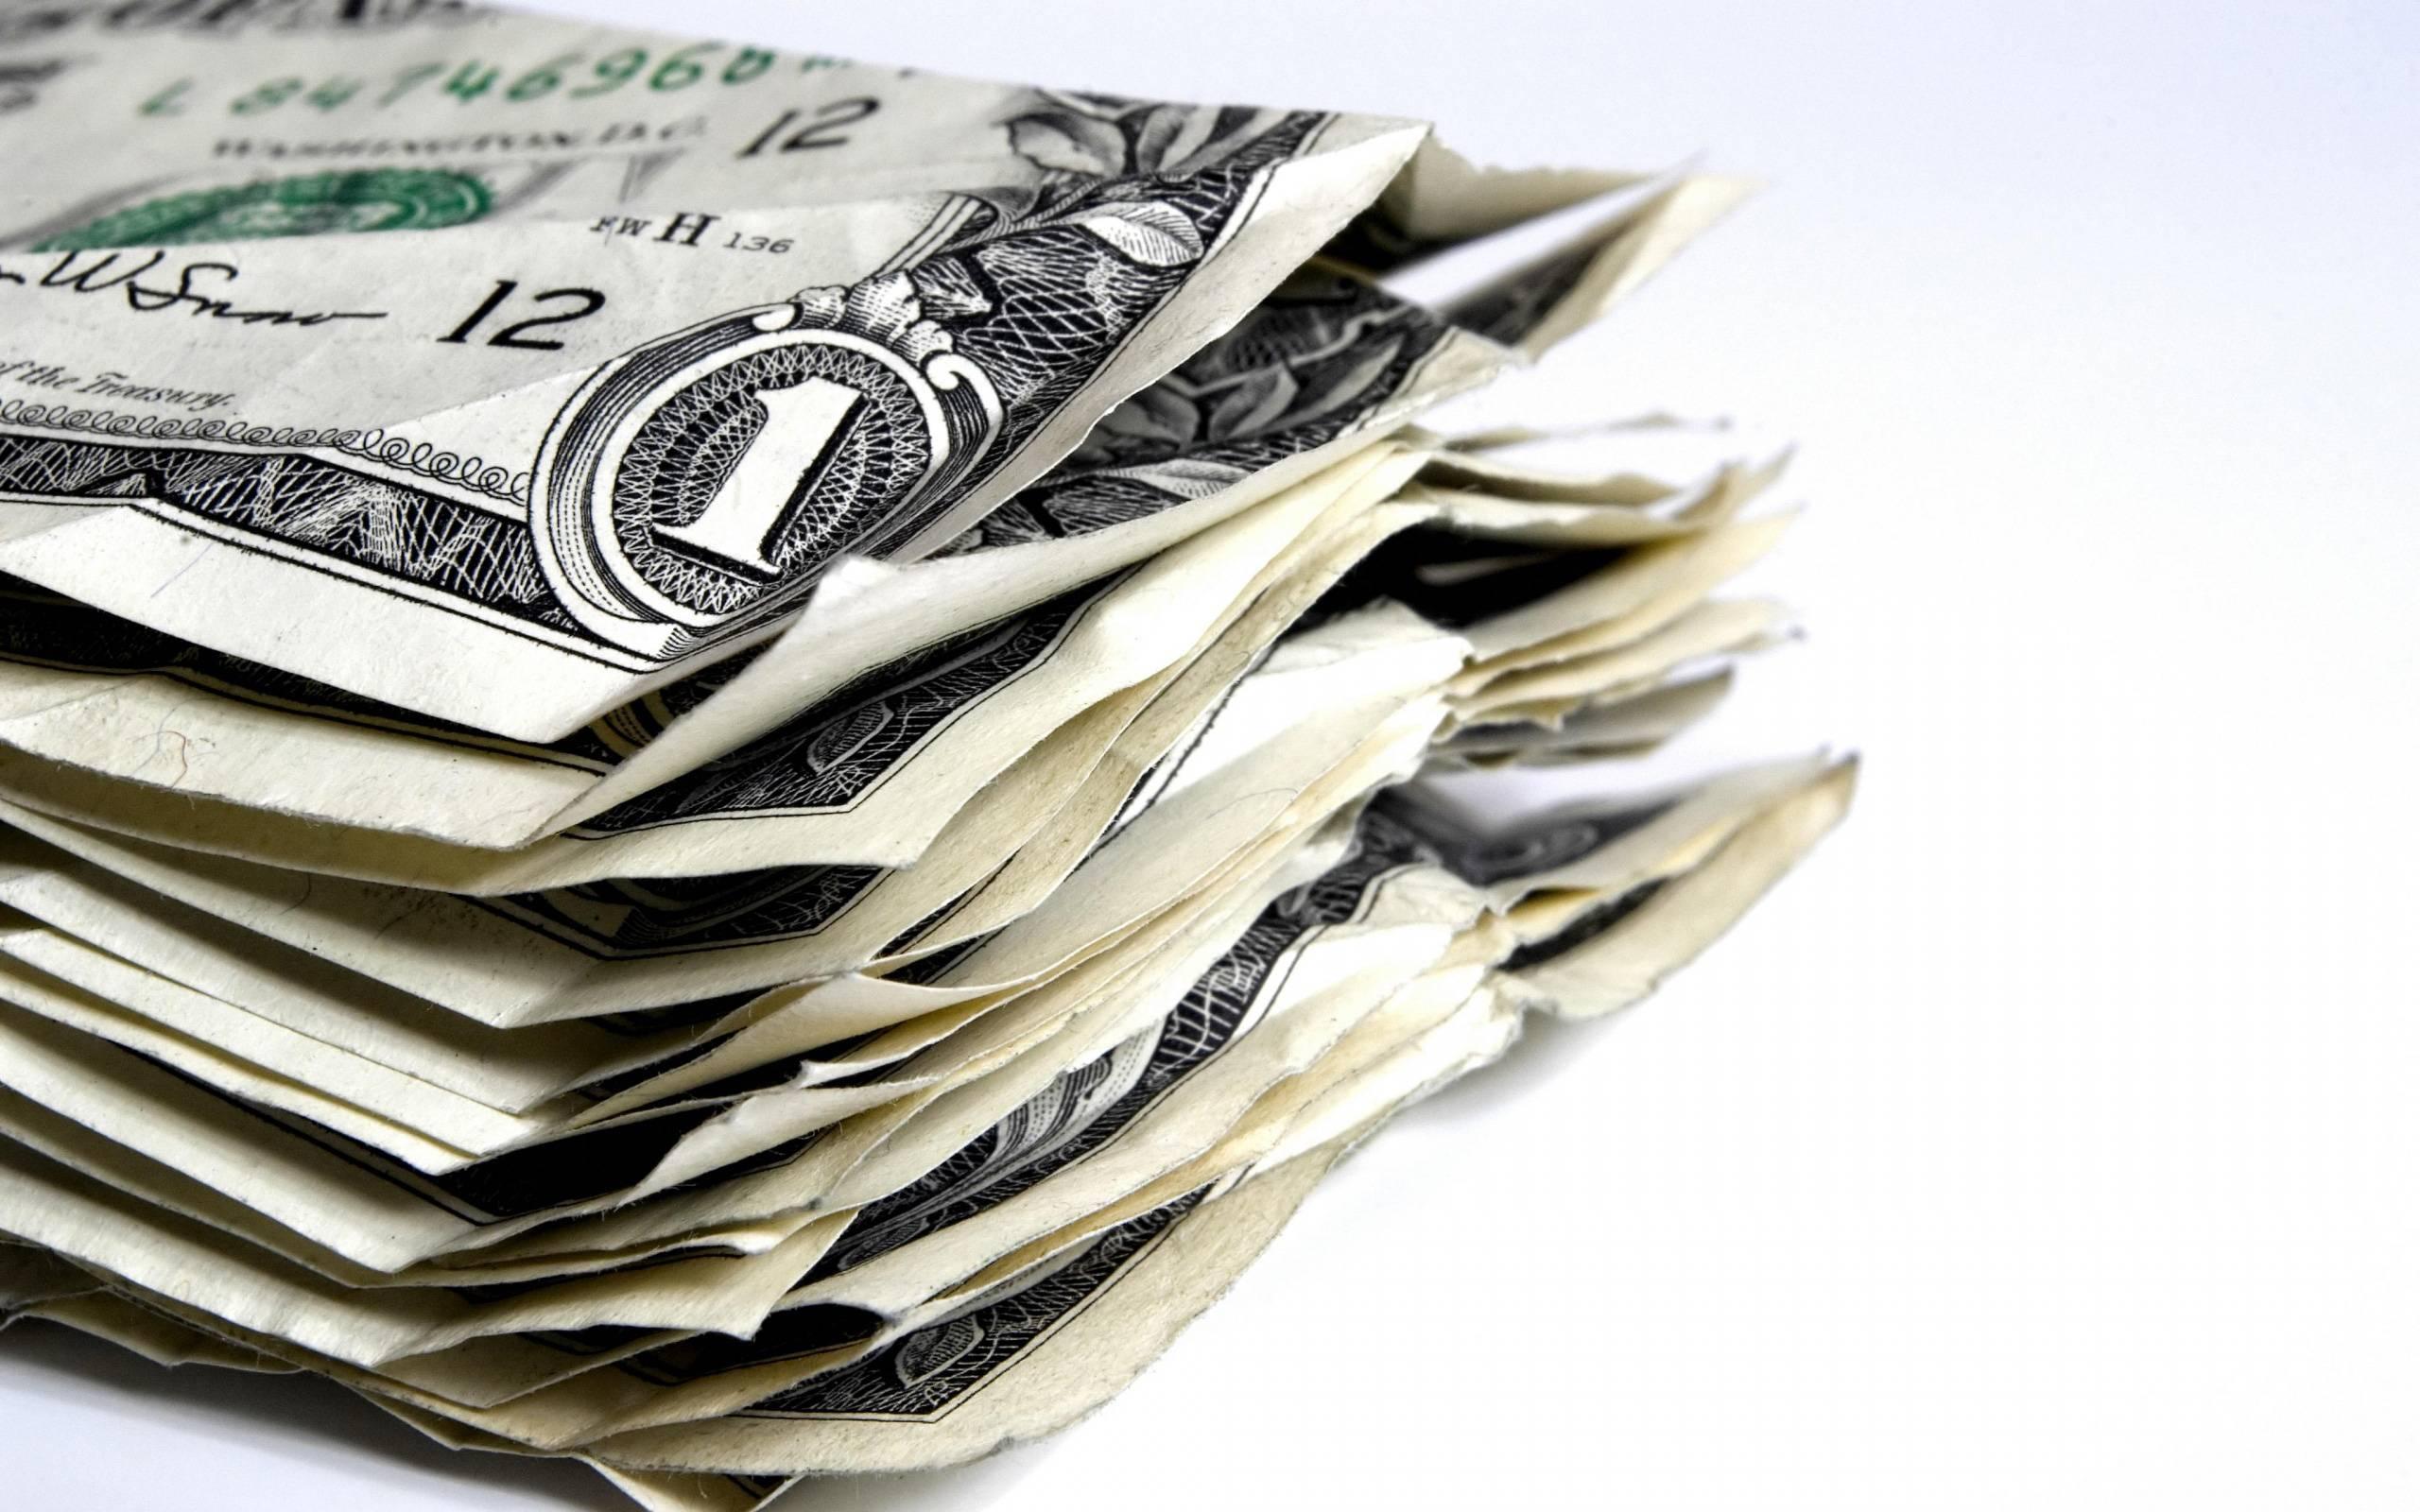 money-2bcc9964506529d184499f9c9c952bc6.jpg